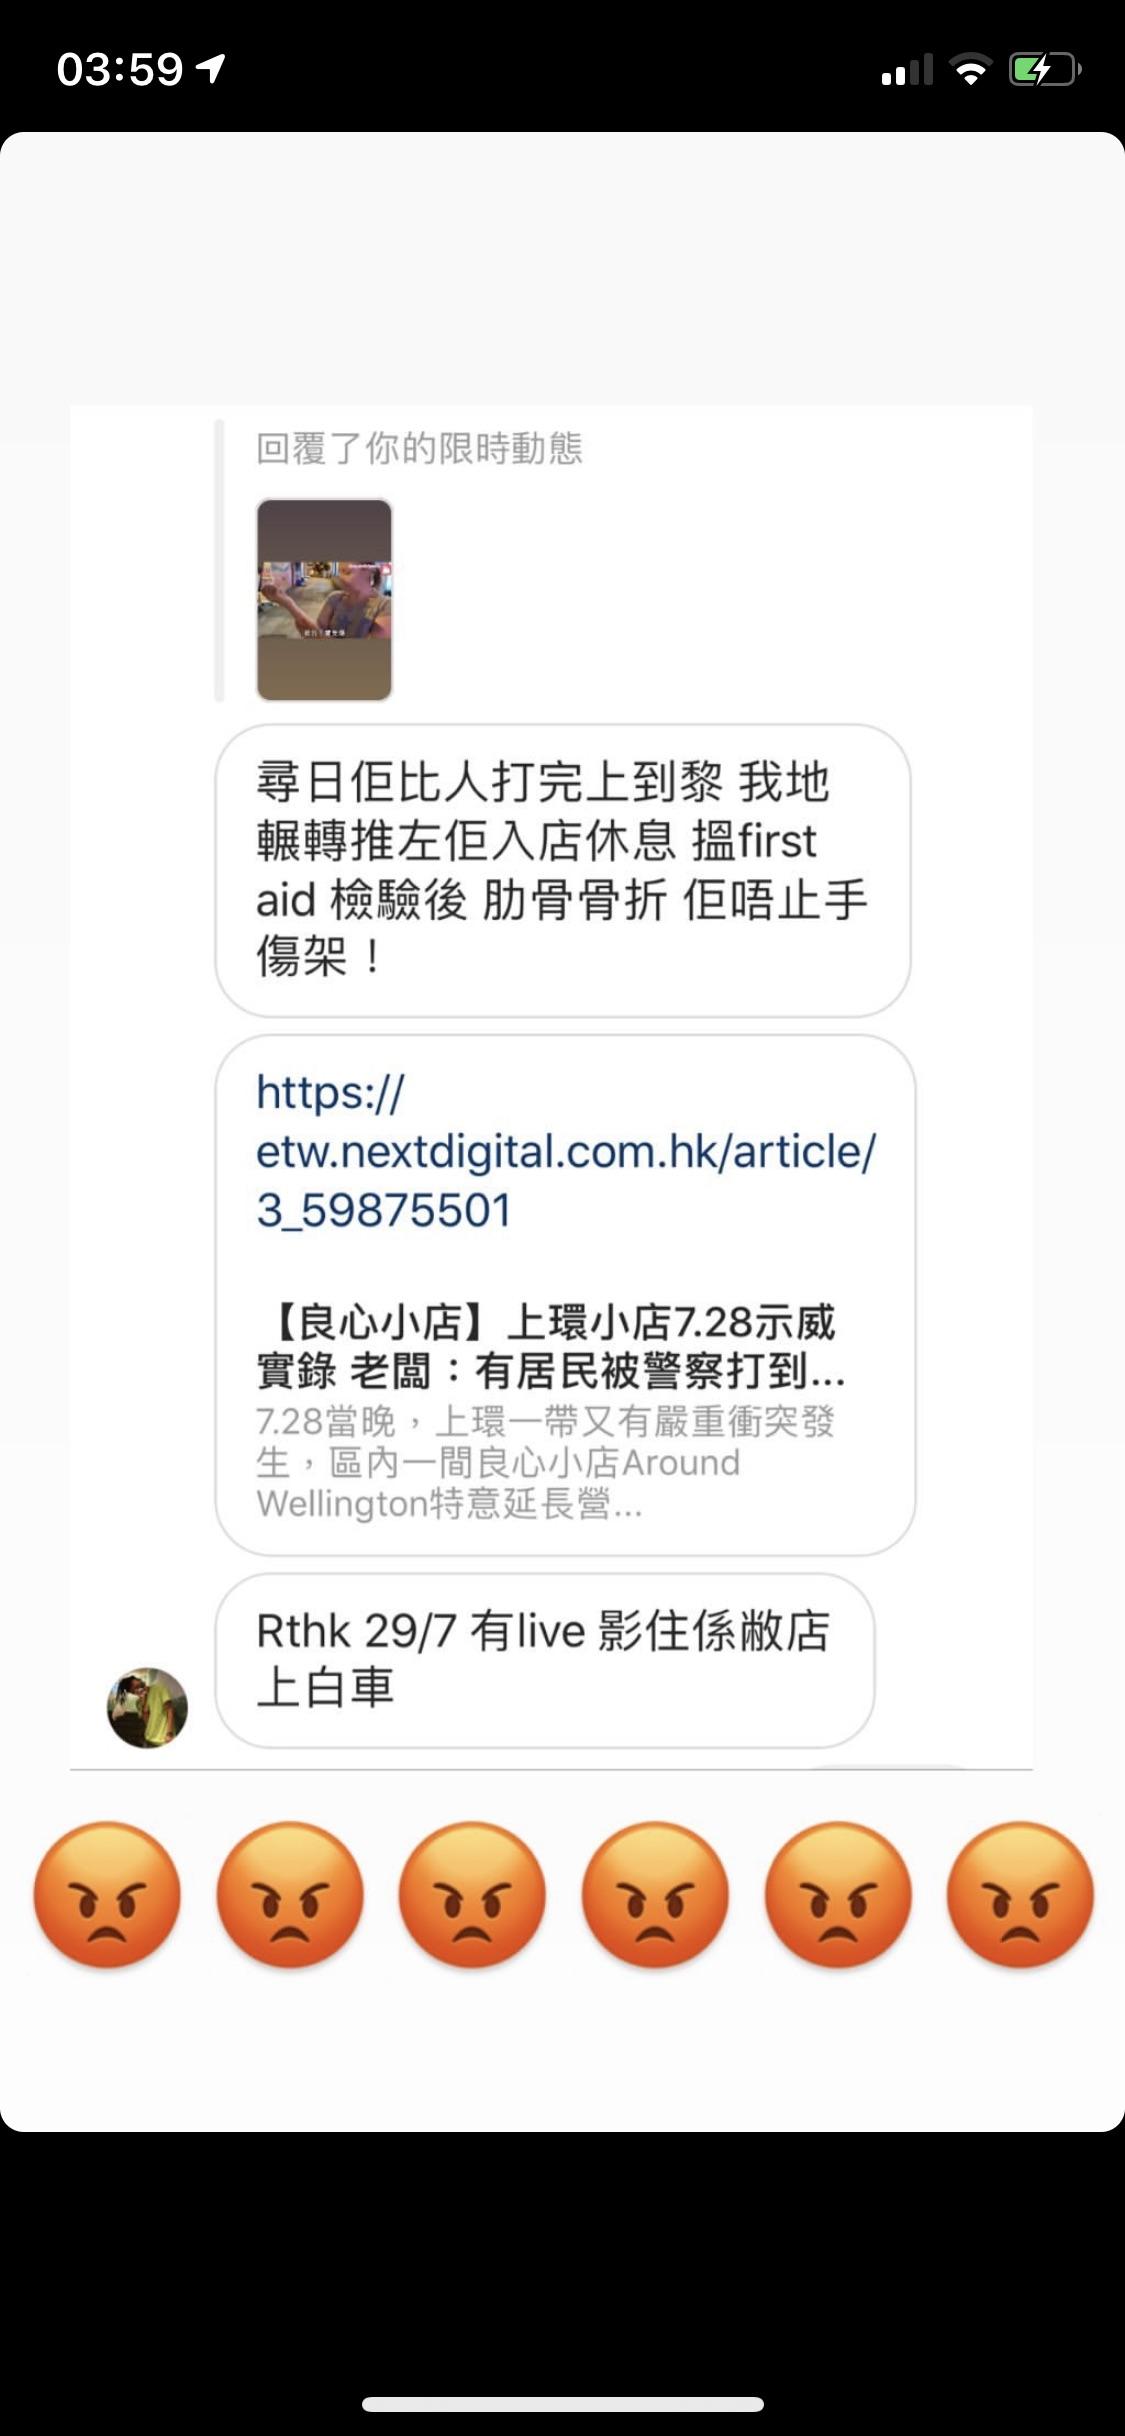 [img]https://upload.cc/i1/2019/07/31/vTNyLg.png[/img]